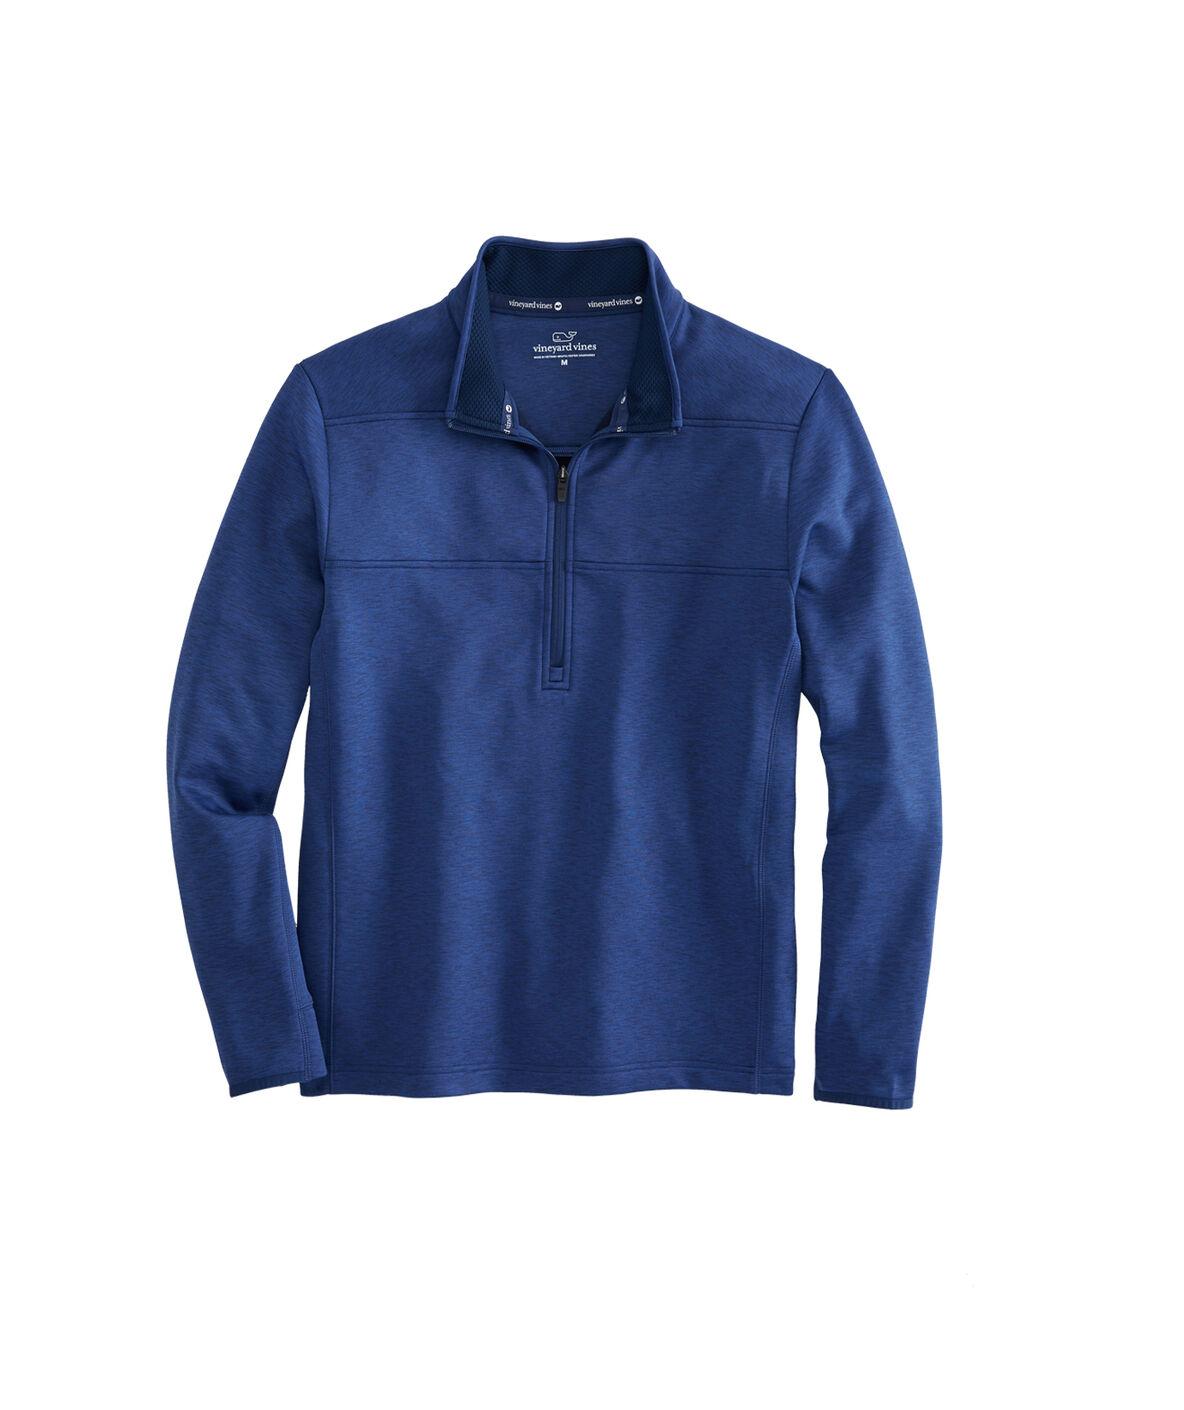 78e92fd8bf08a Shop Mens Performance Space-Dyed Shep Shirt at vineyard vines